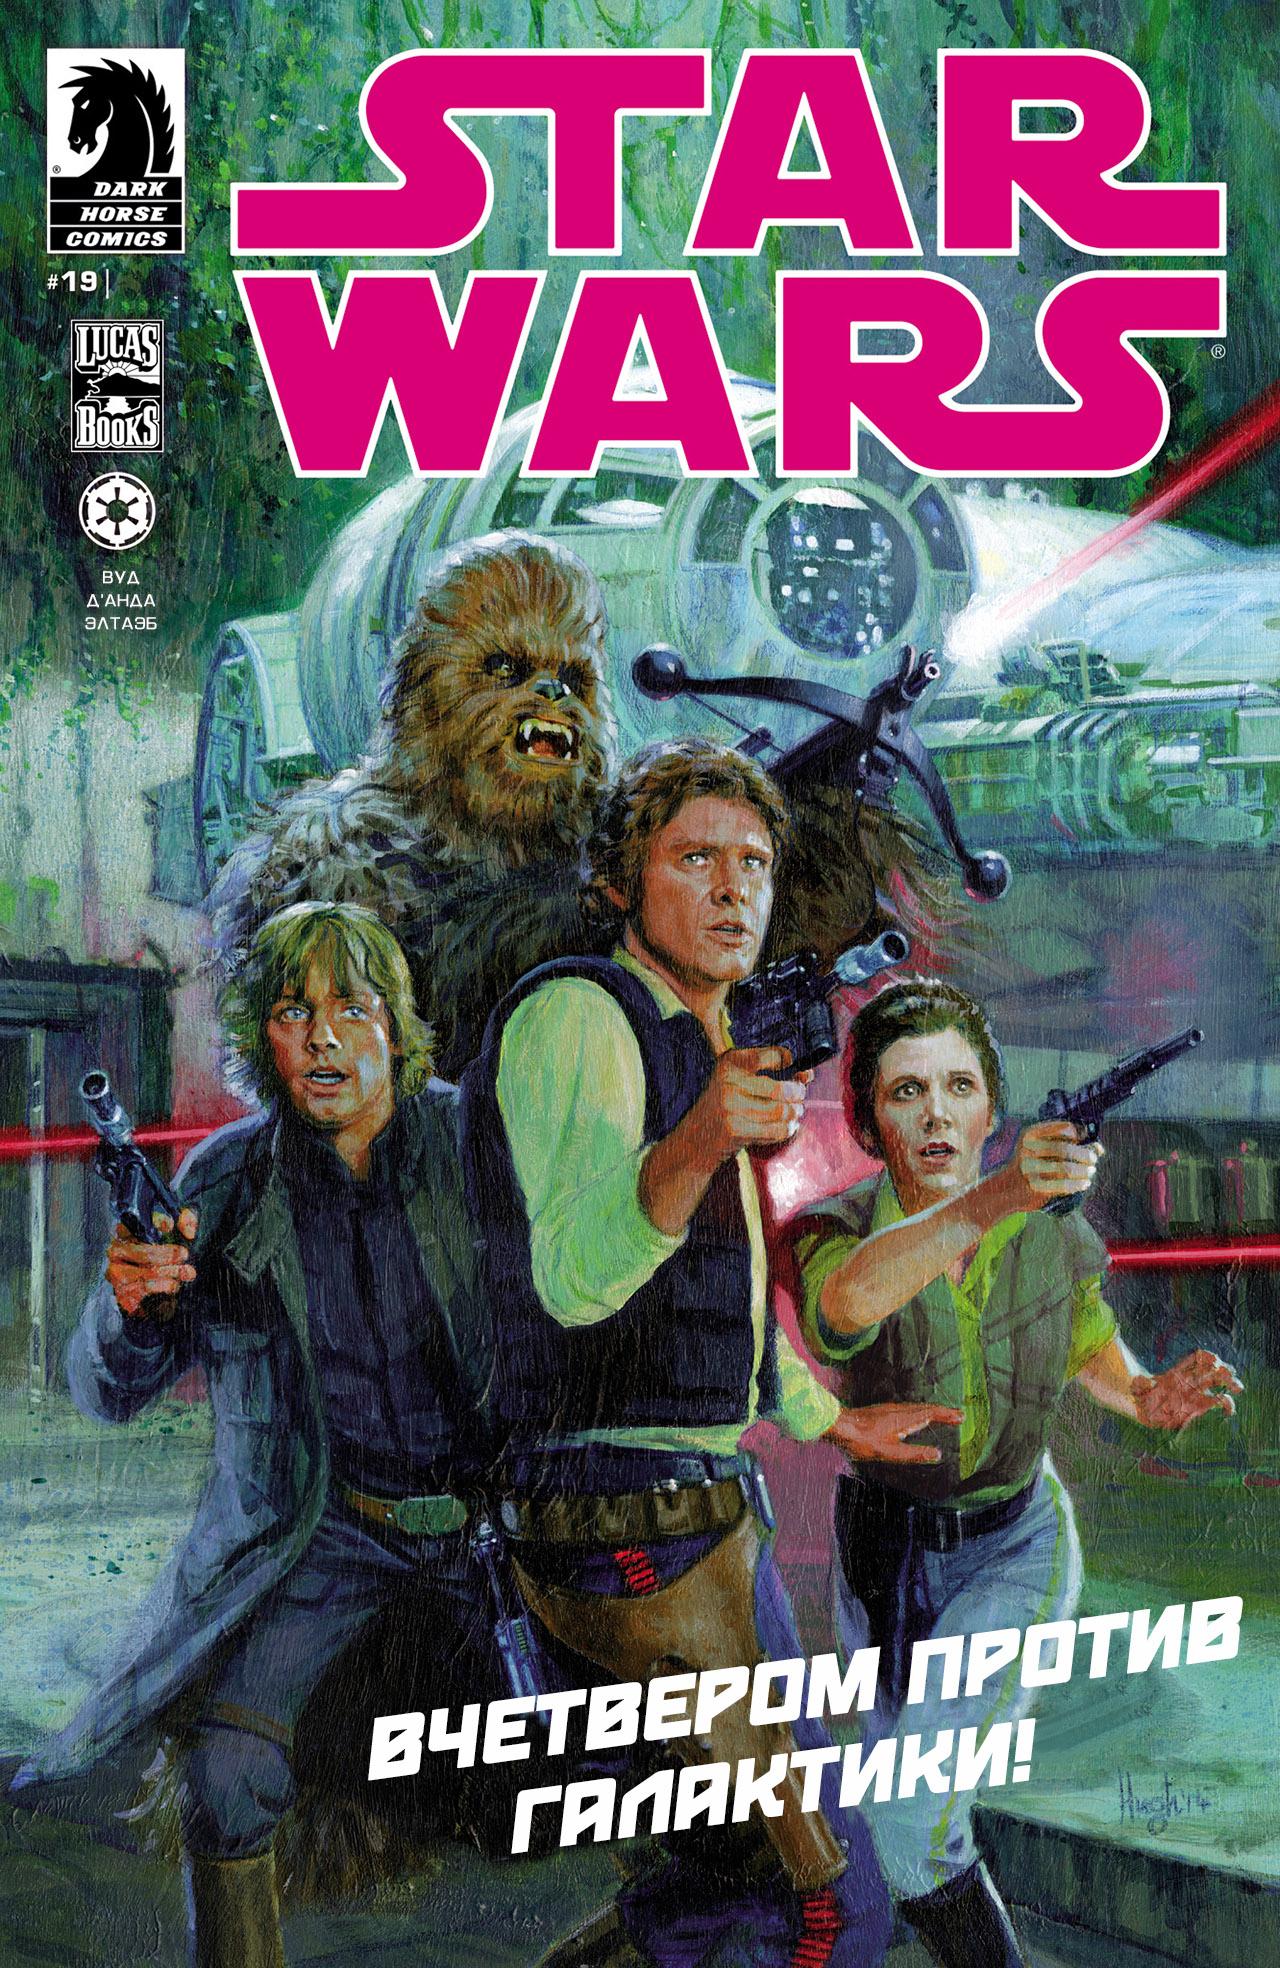 Звёздные войны 19: Разбитая мечта, часть 1